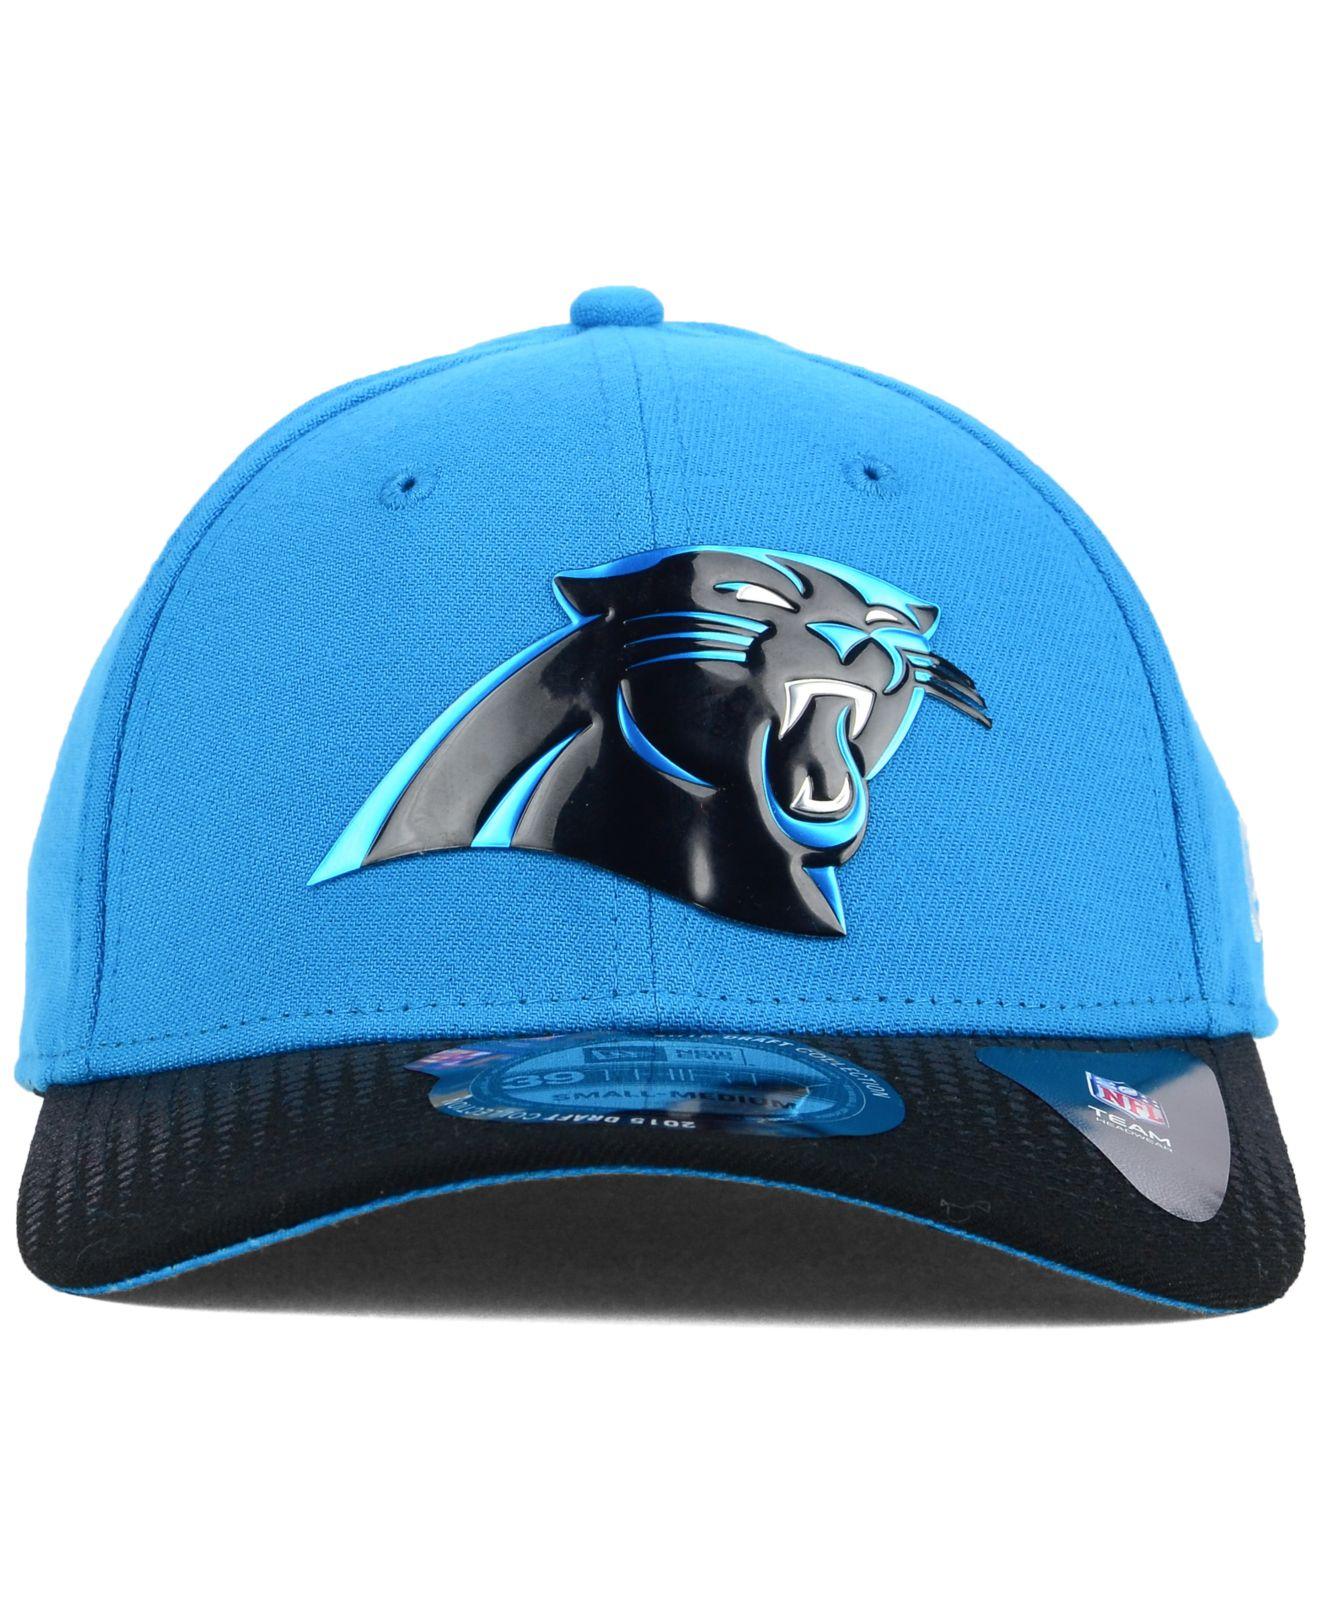 Lyst - KTZ Carolina Panthers 2015 Nfl Draft 39Thirty Cap in Blue for Men 717b623e487